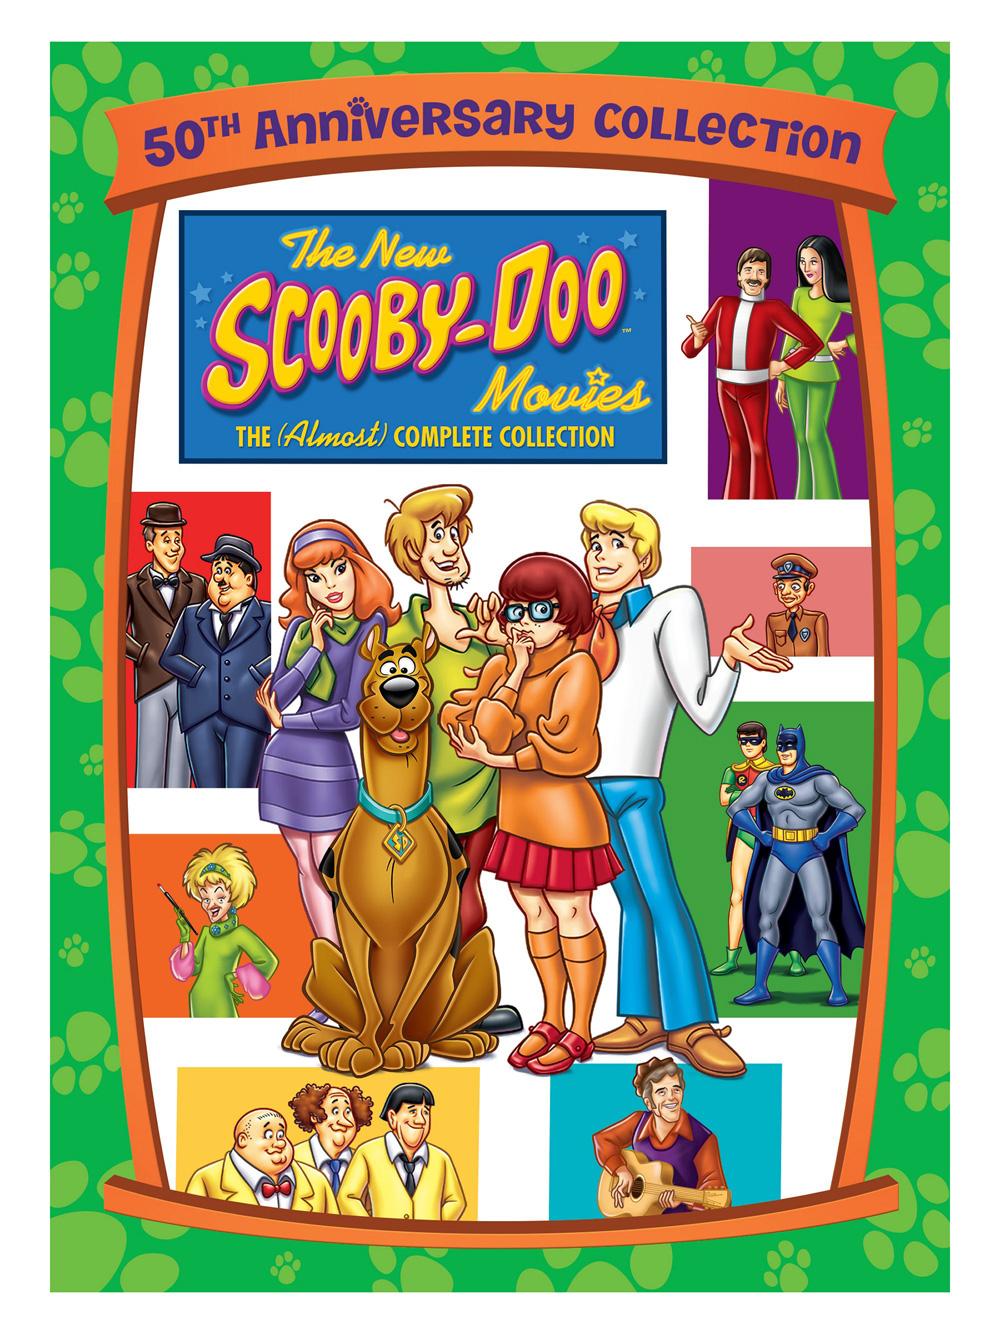 Scooby-Doo Movies